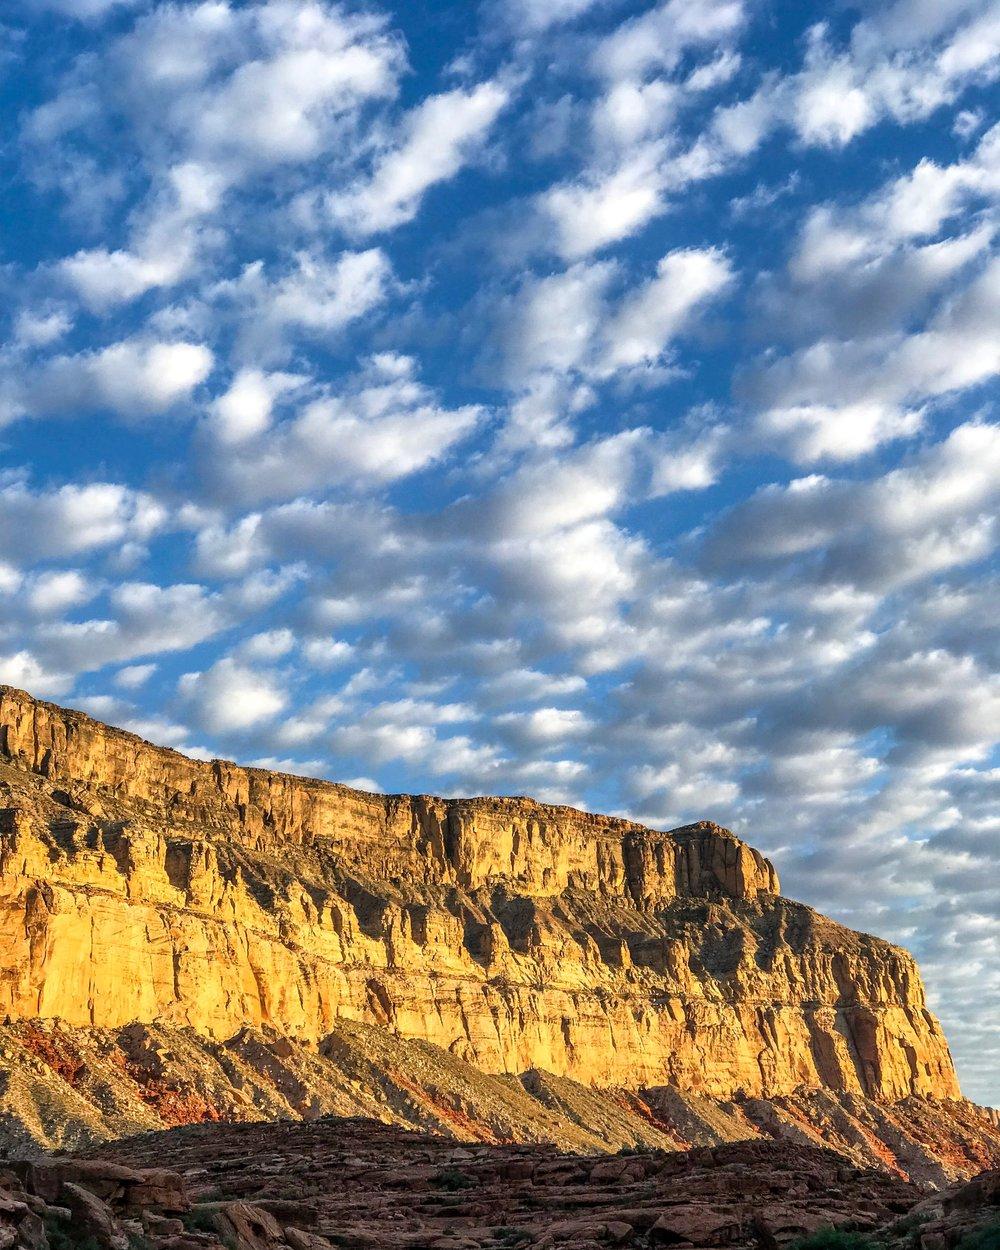 Clouds over Havasu Canyon. Havasupai Indian Reservation